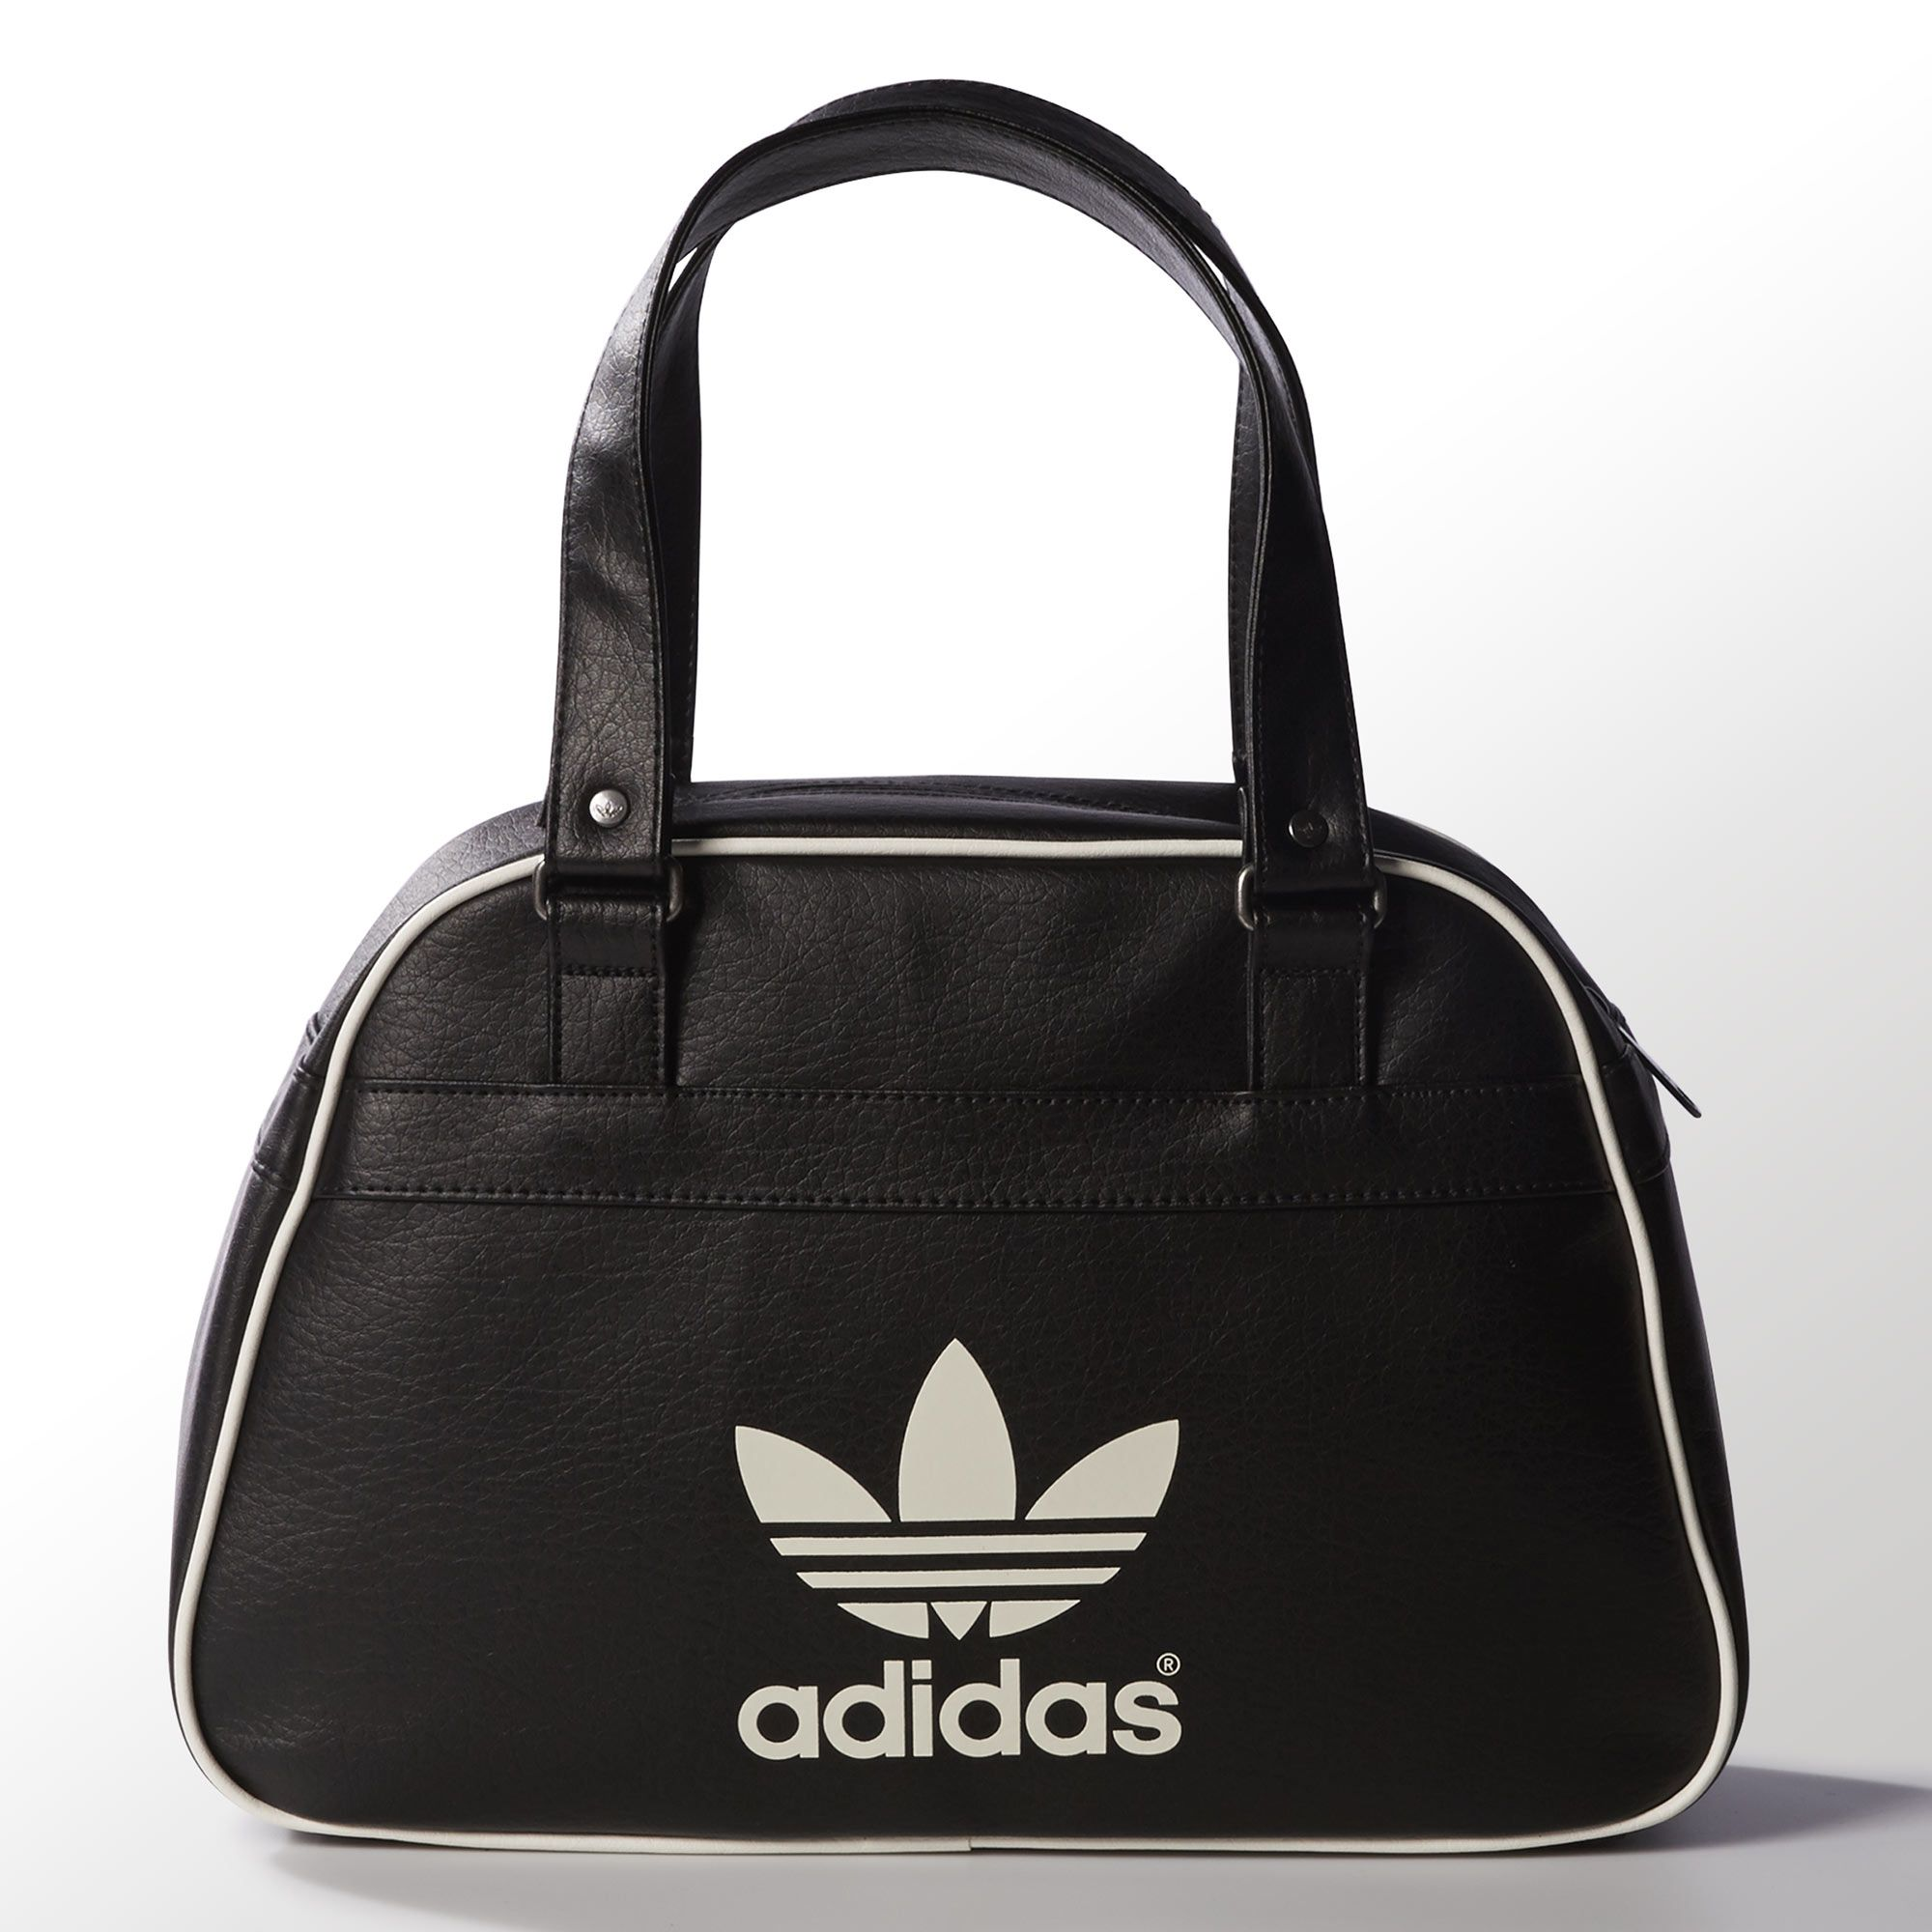 3641c797f481 adidas Classic Bowling Bag